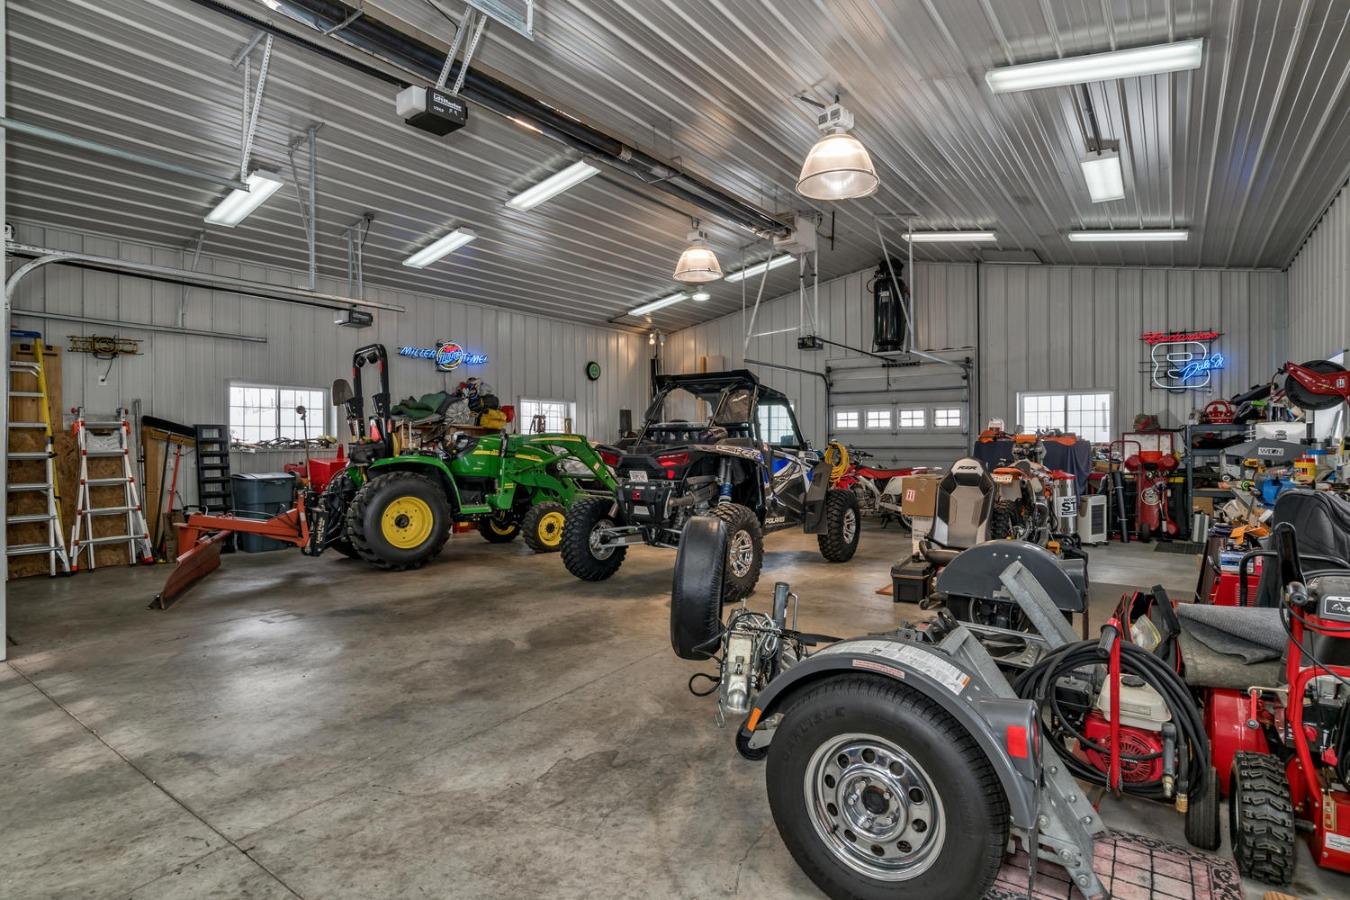 Heated Barn/Workshop is Every Man's Dream